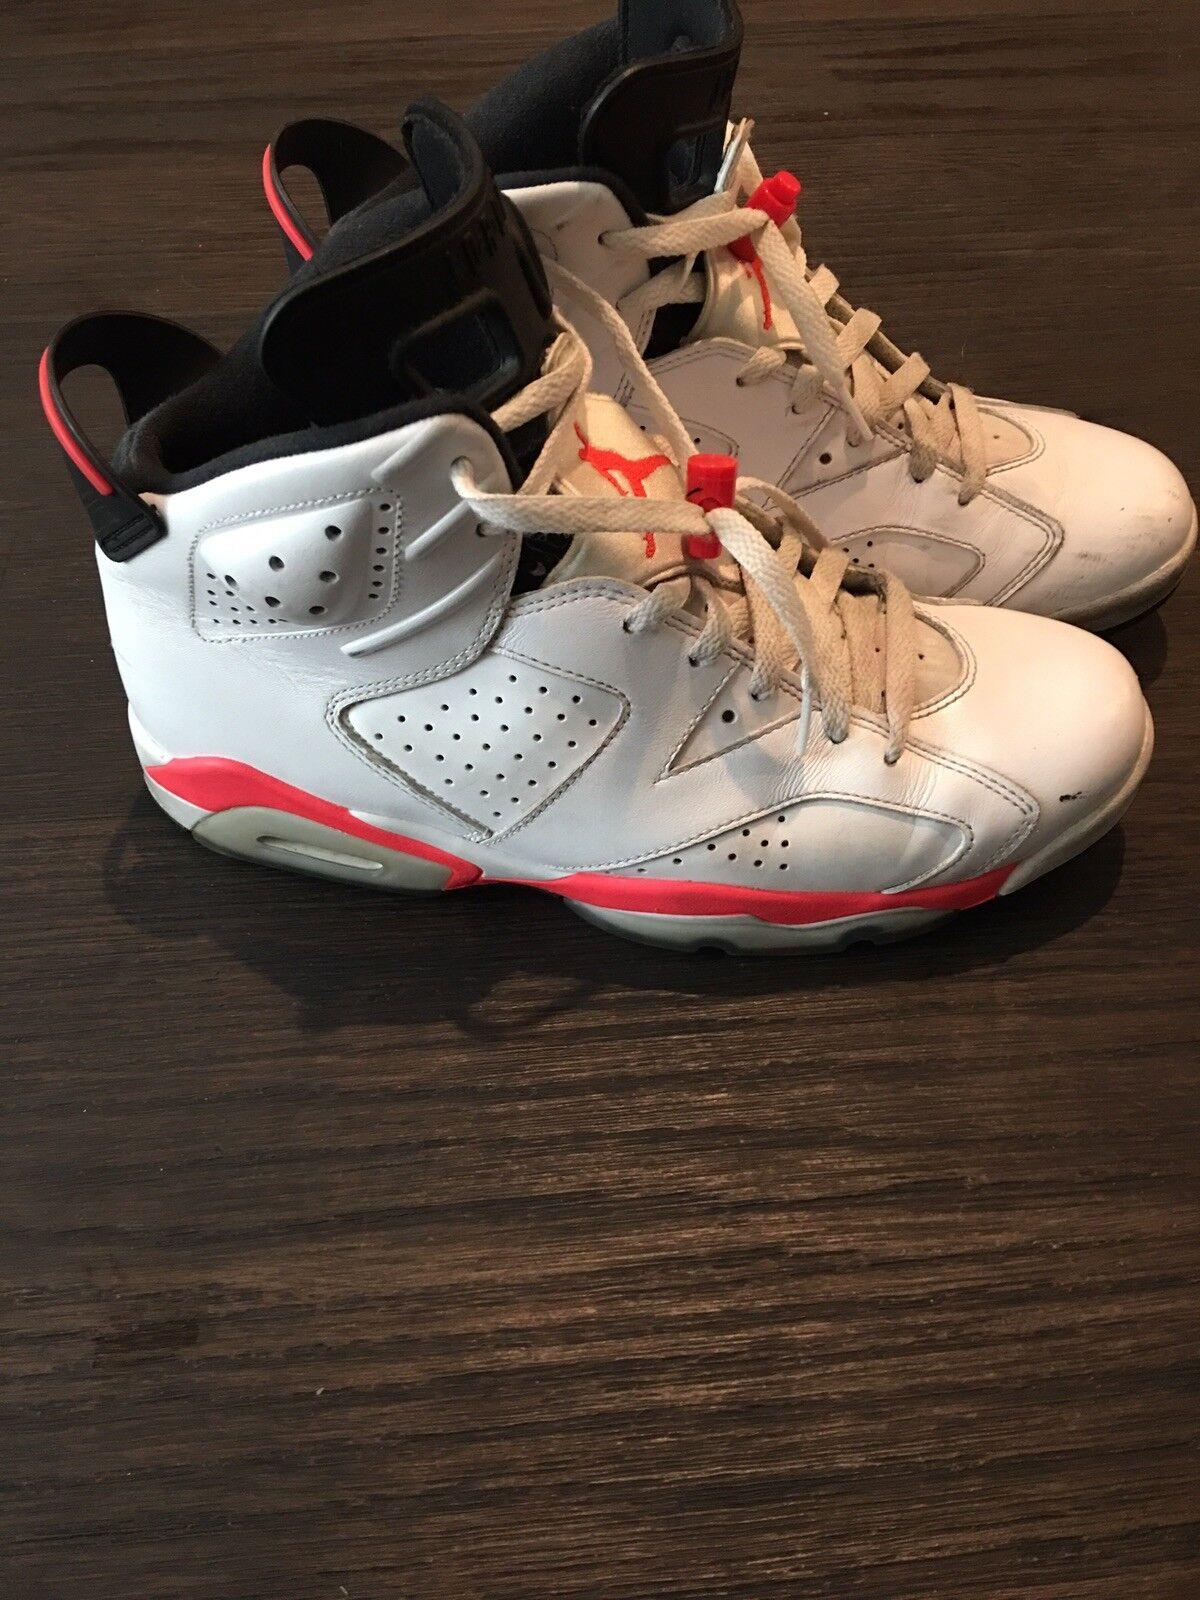 Air Jordan 6 - White Infrared - Size 10.5